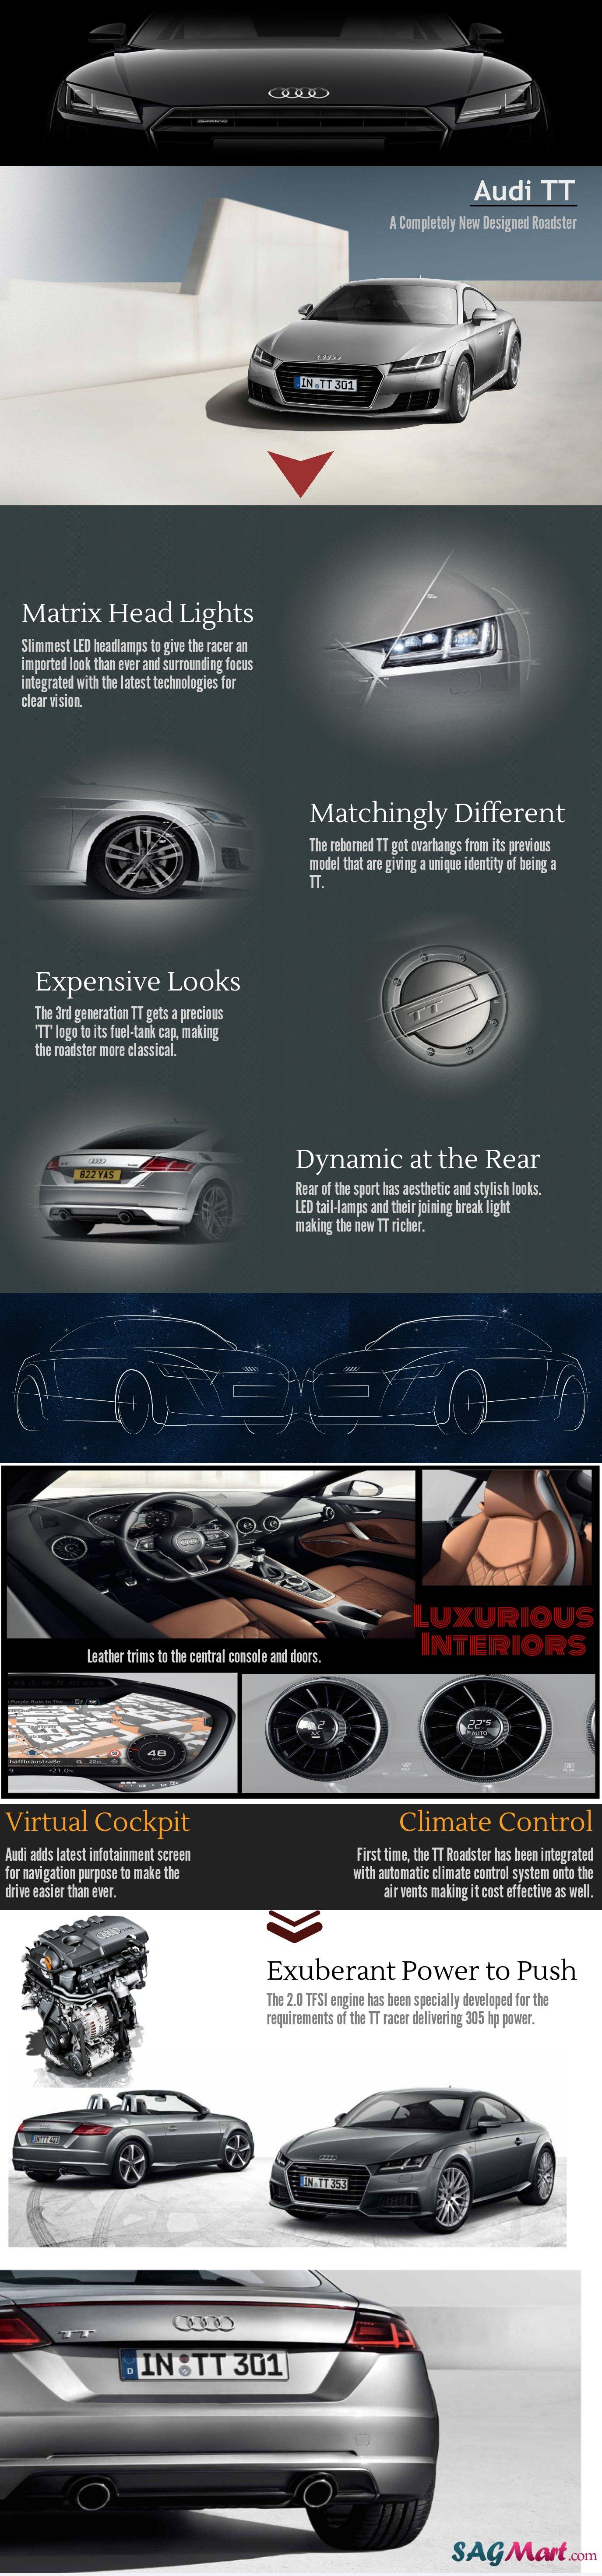 Audi TT Roadster Infographic